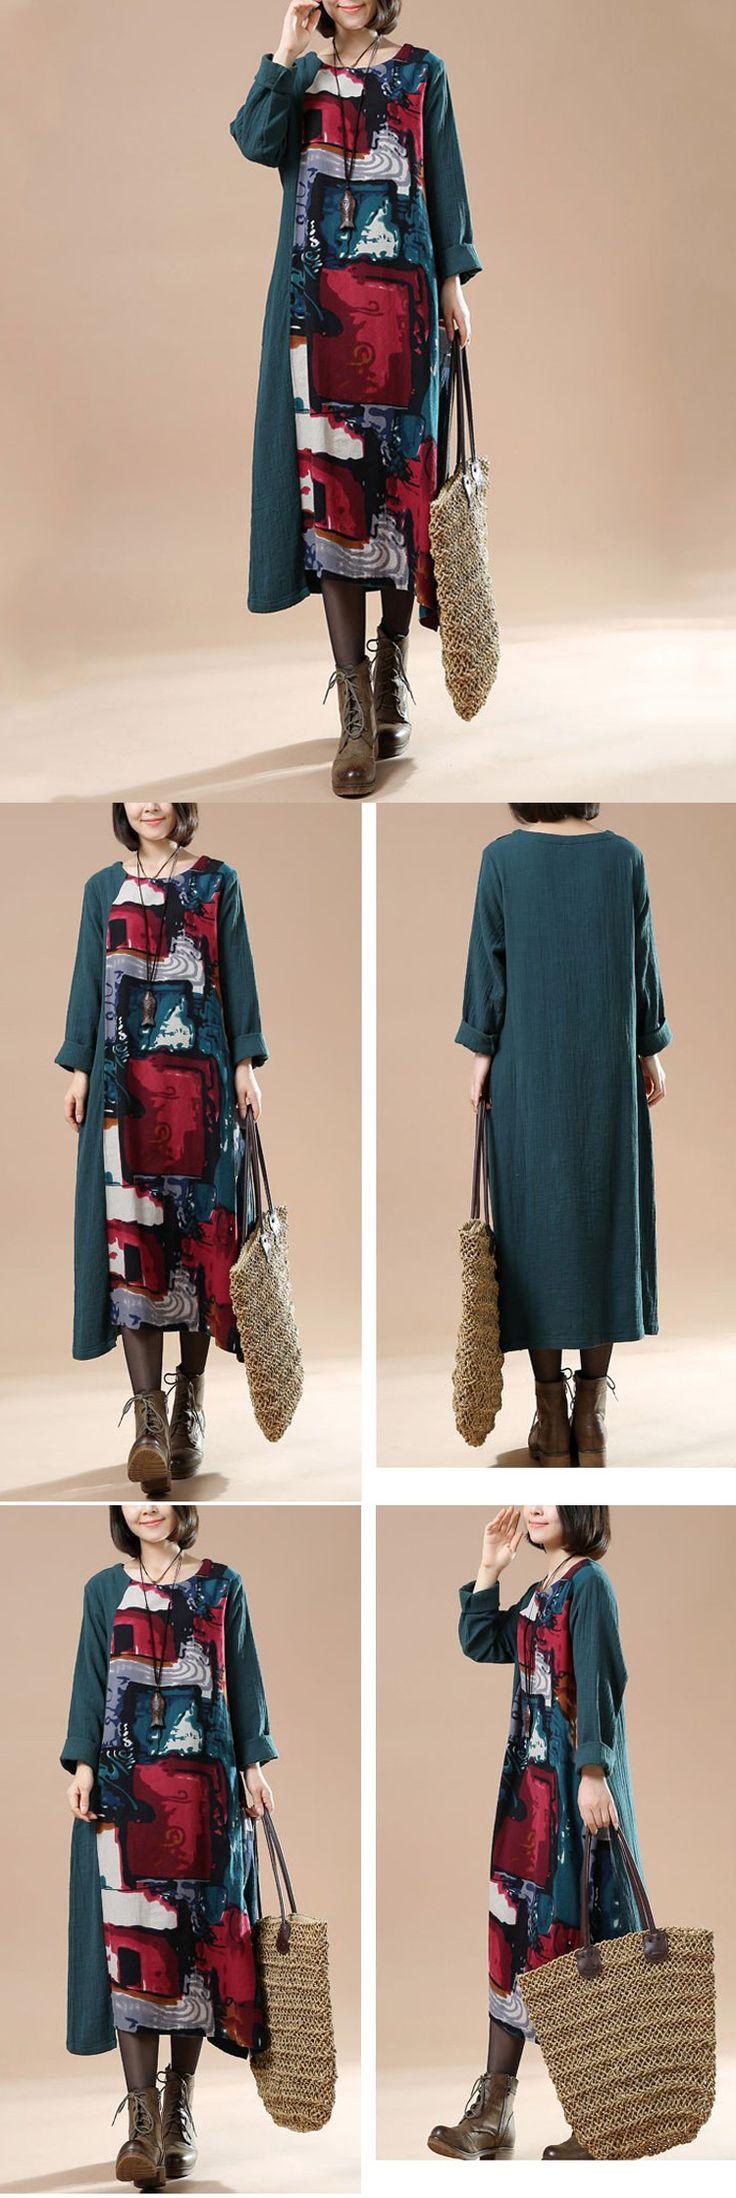 Women Autumn Plus Size Retro Print Long Sleeve Stitching Dress